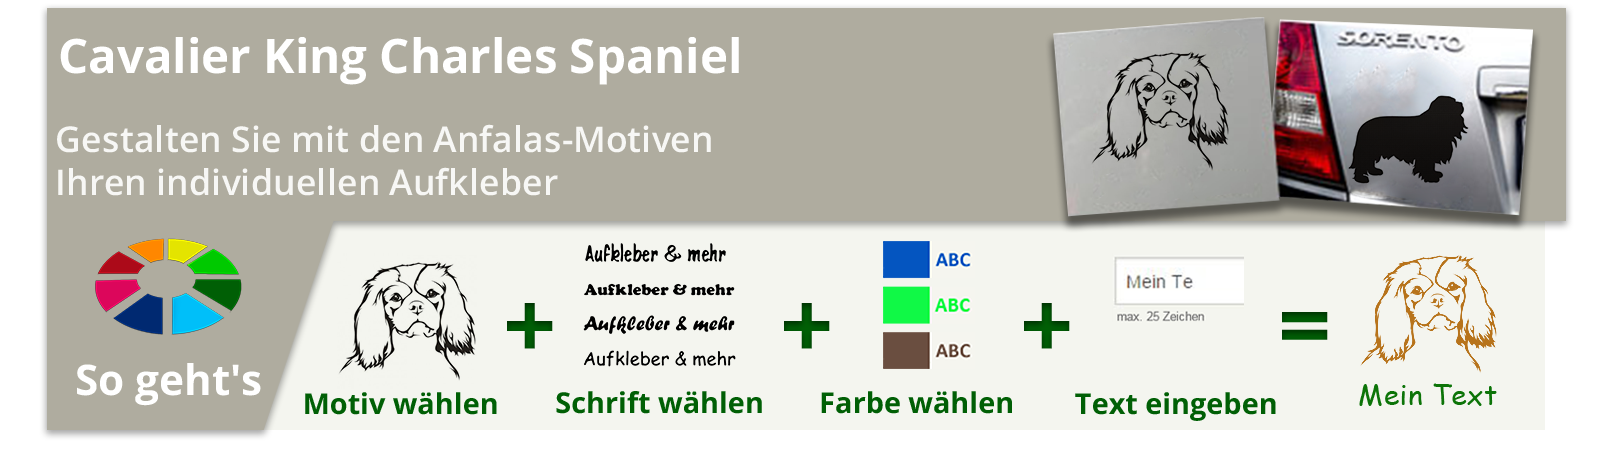 Cavalier King Charles Spaniel Aufkleber